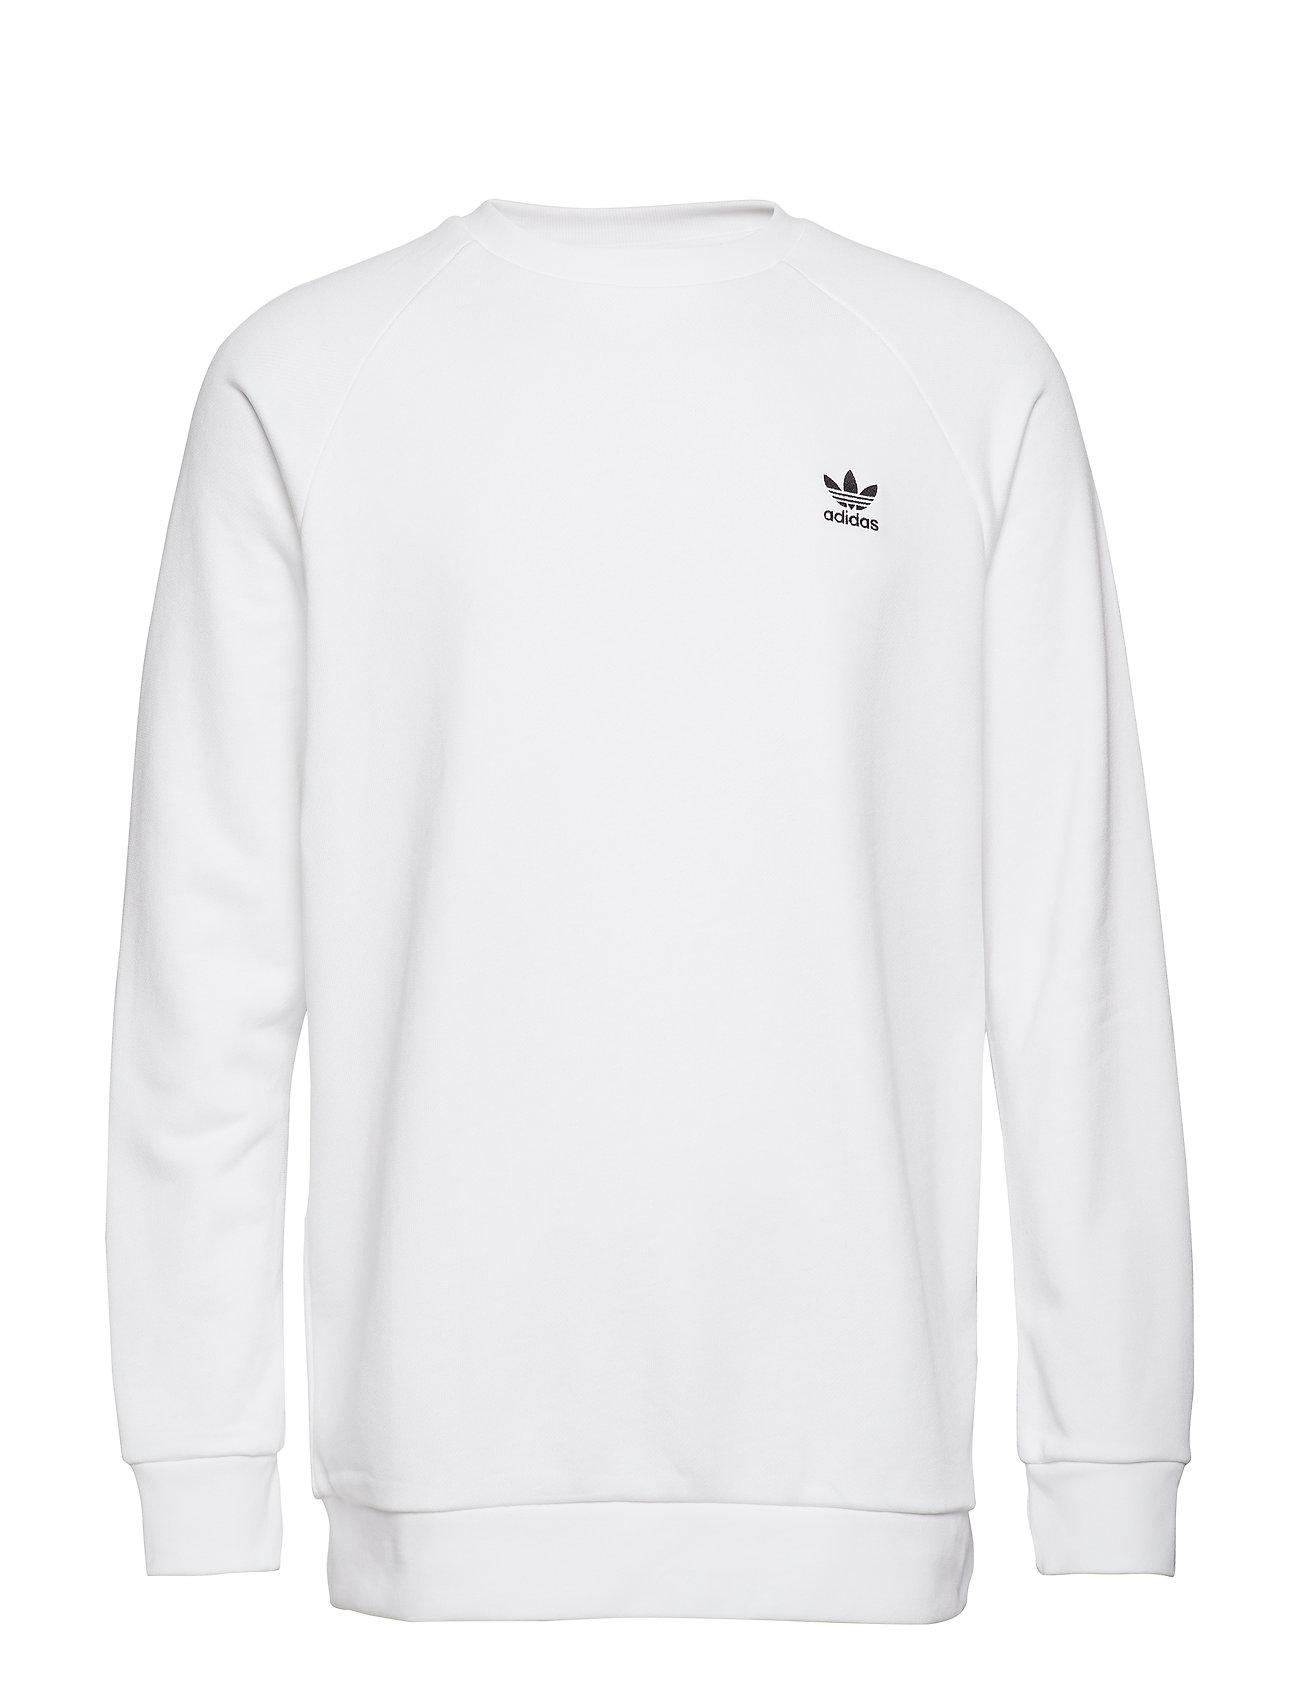 adidas originals hoodie grey, adidas Performance ESSENTIAL